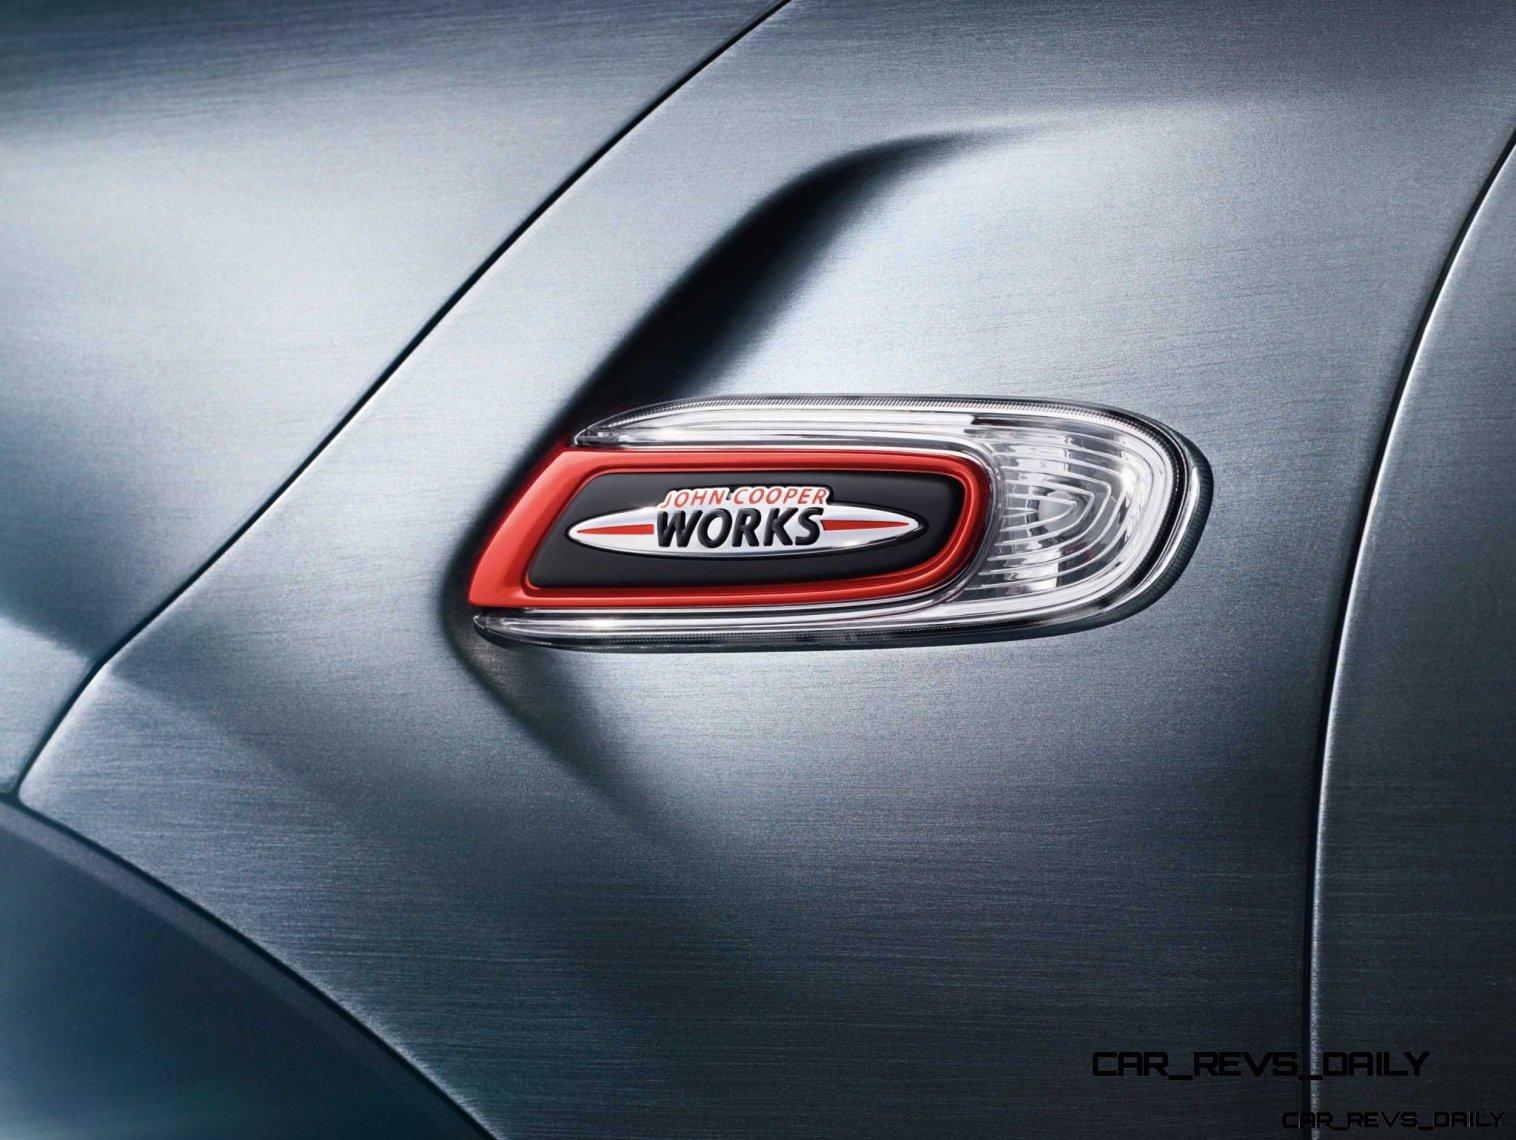 2015 MINI Cooper JCW Concept Brushed-Alloy Paints Hot Bod 15